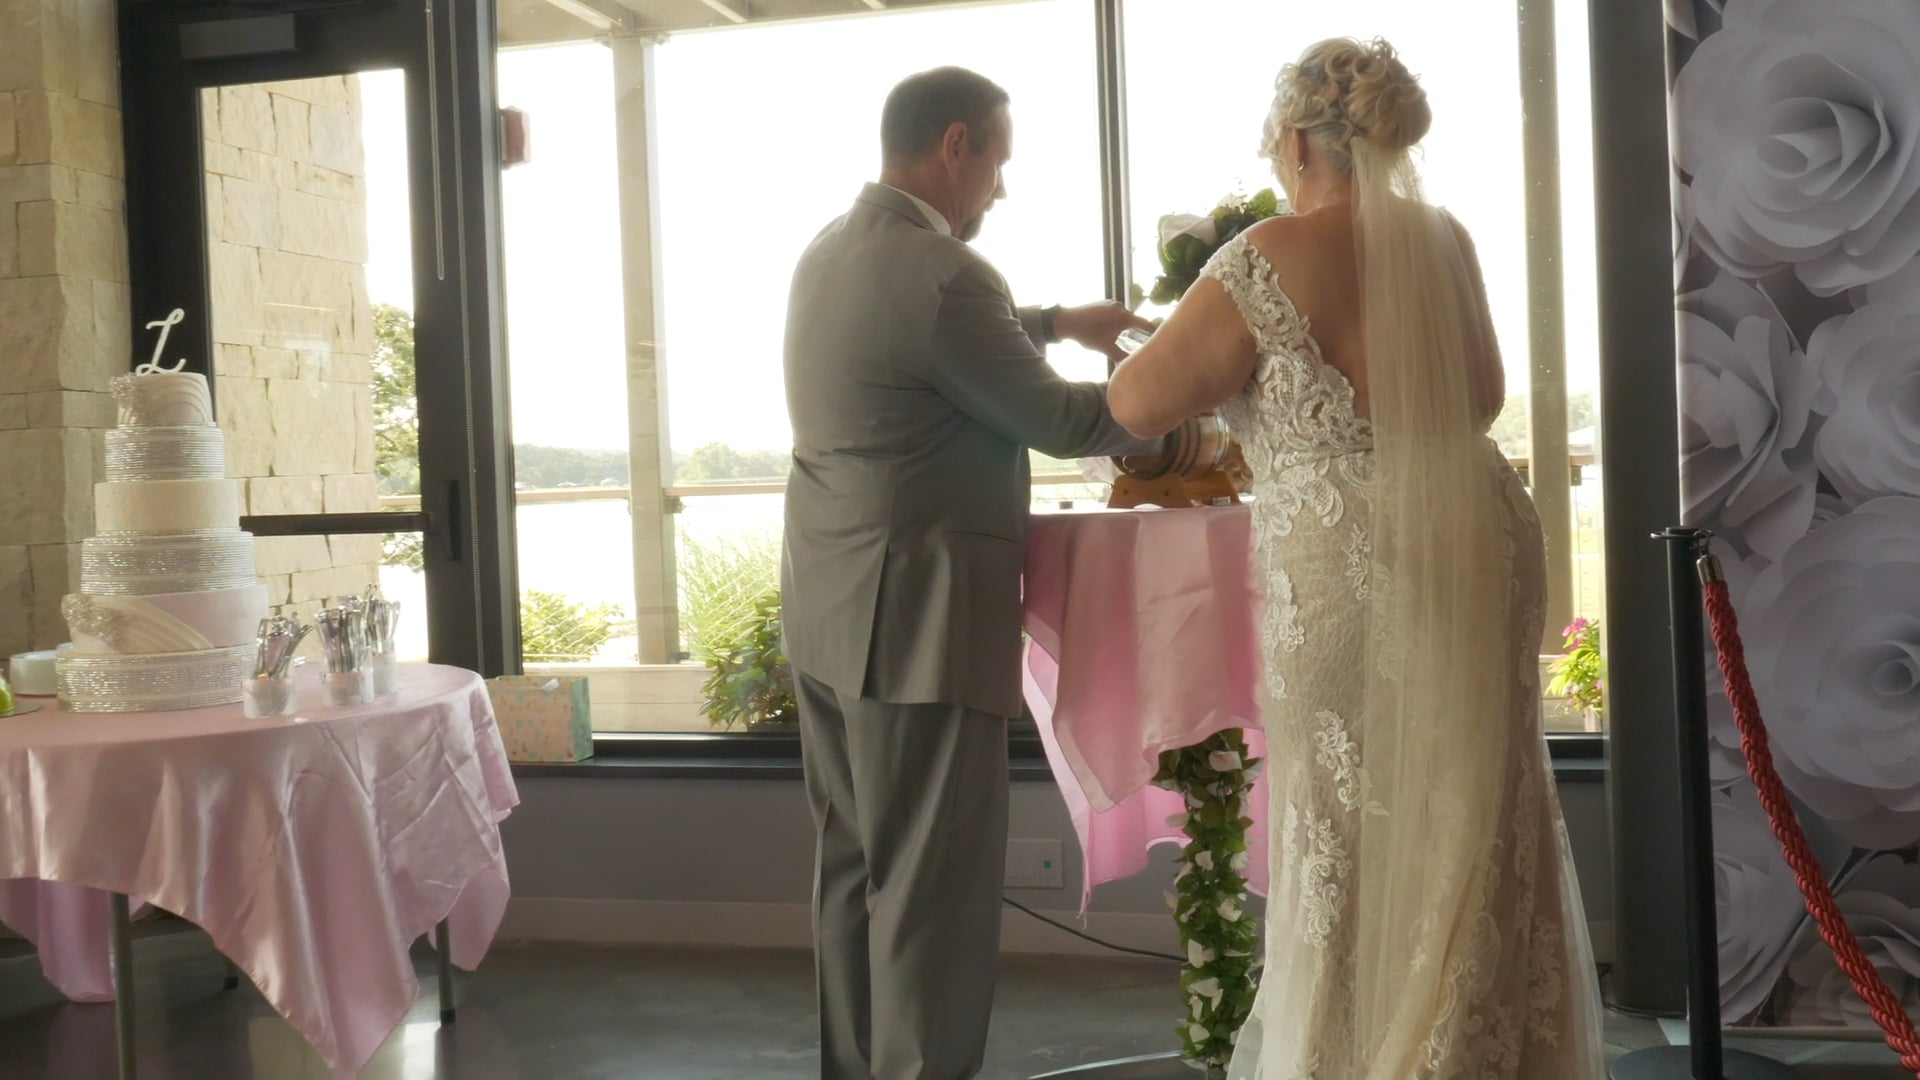 Mike & Pam Wedding 2020 | by Soul Fuel Wedding Films